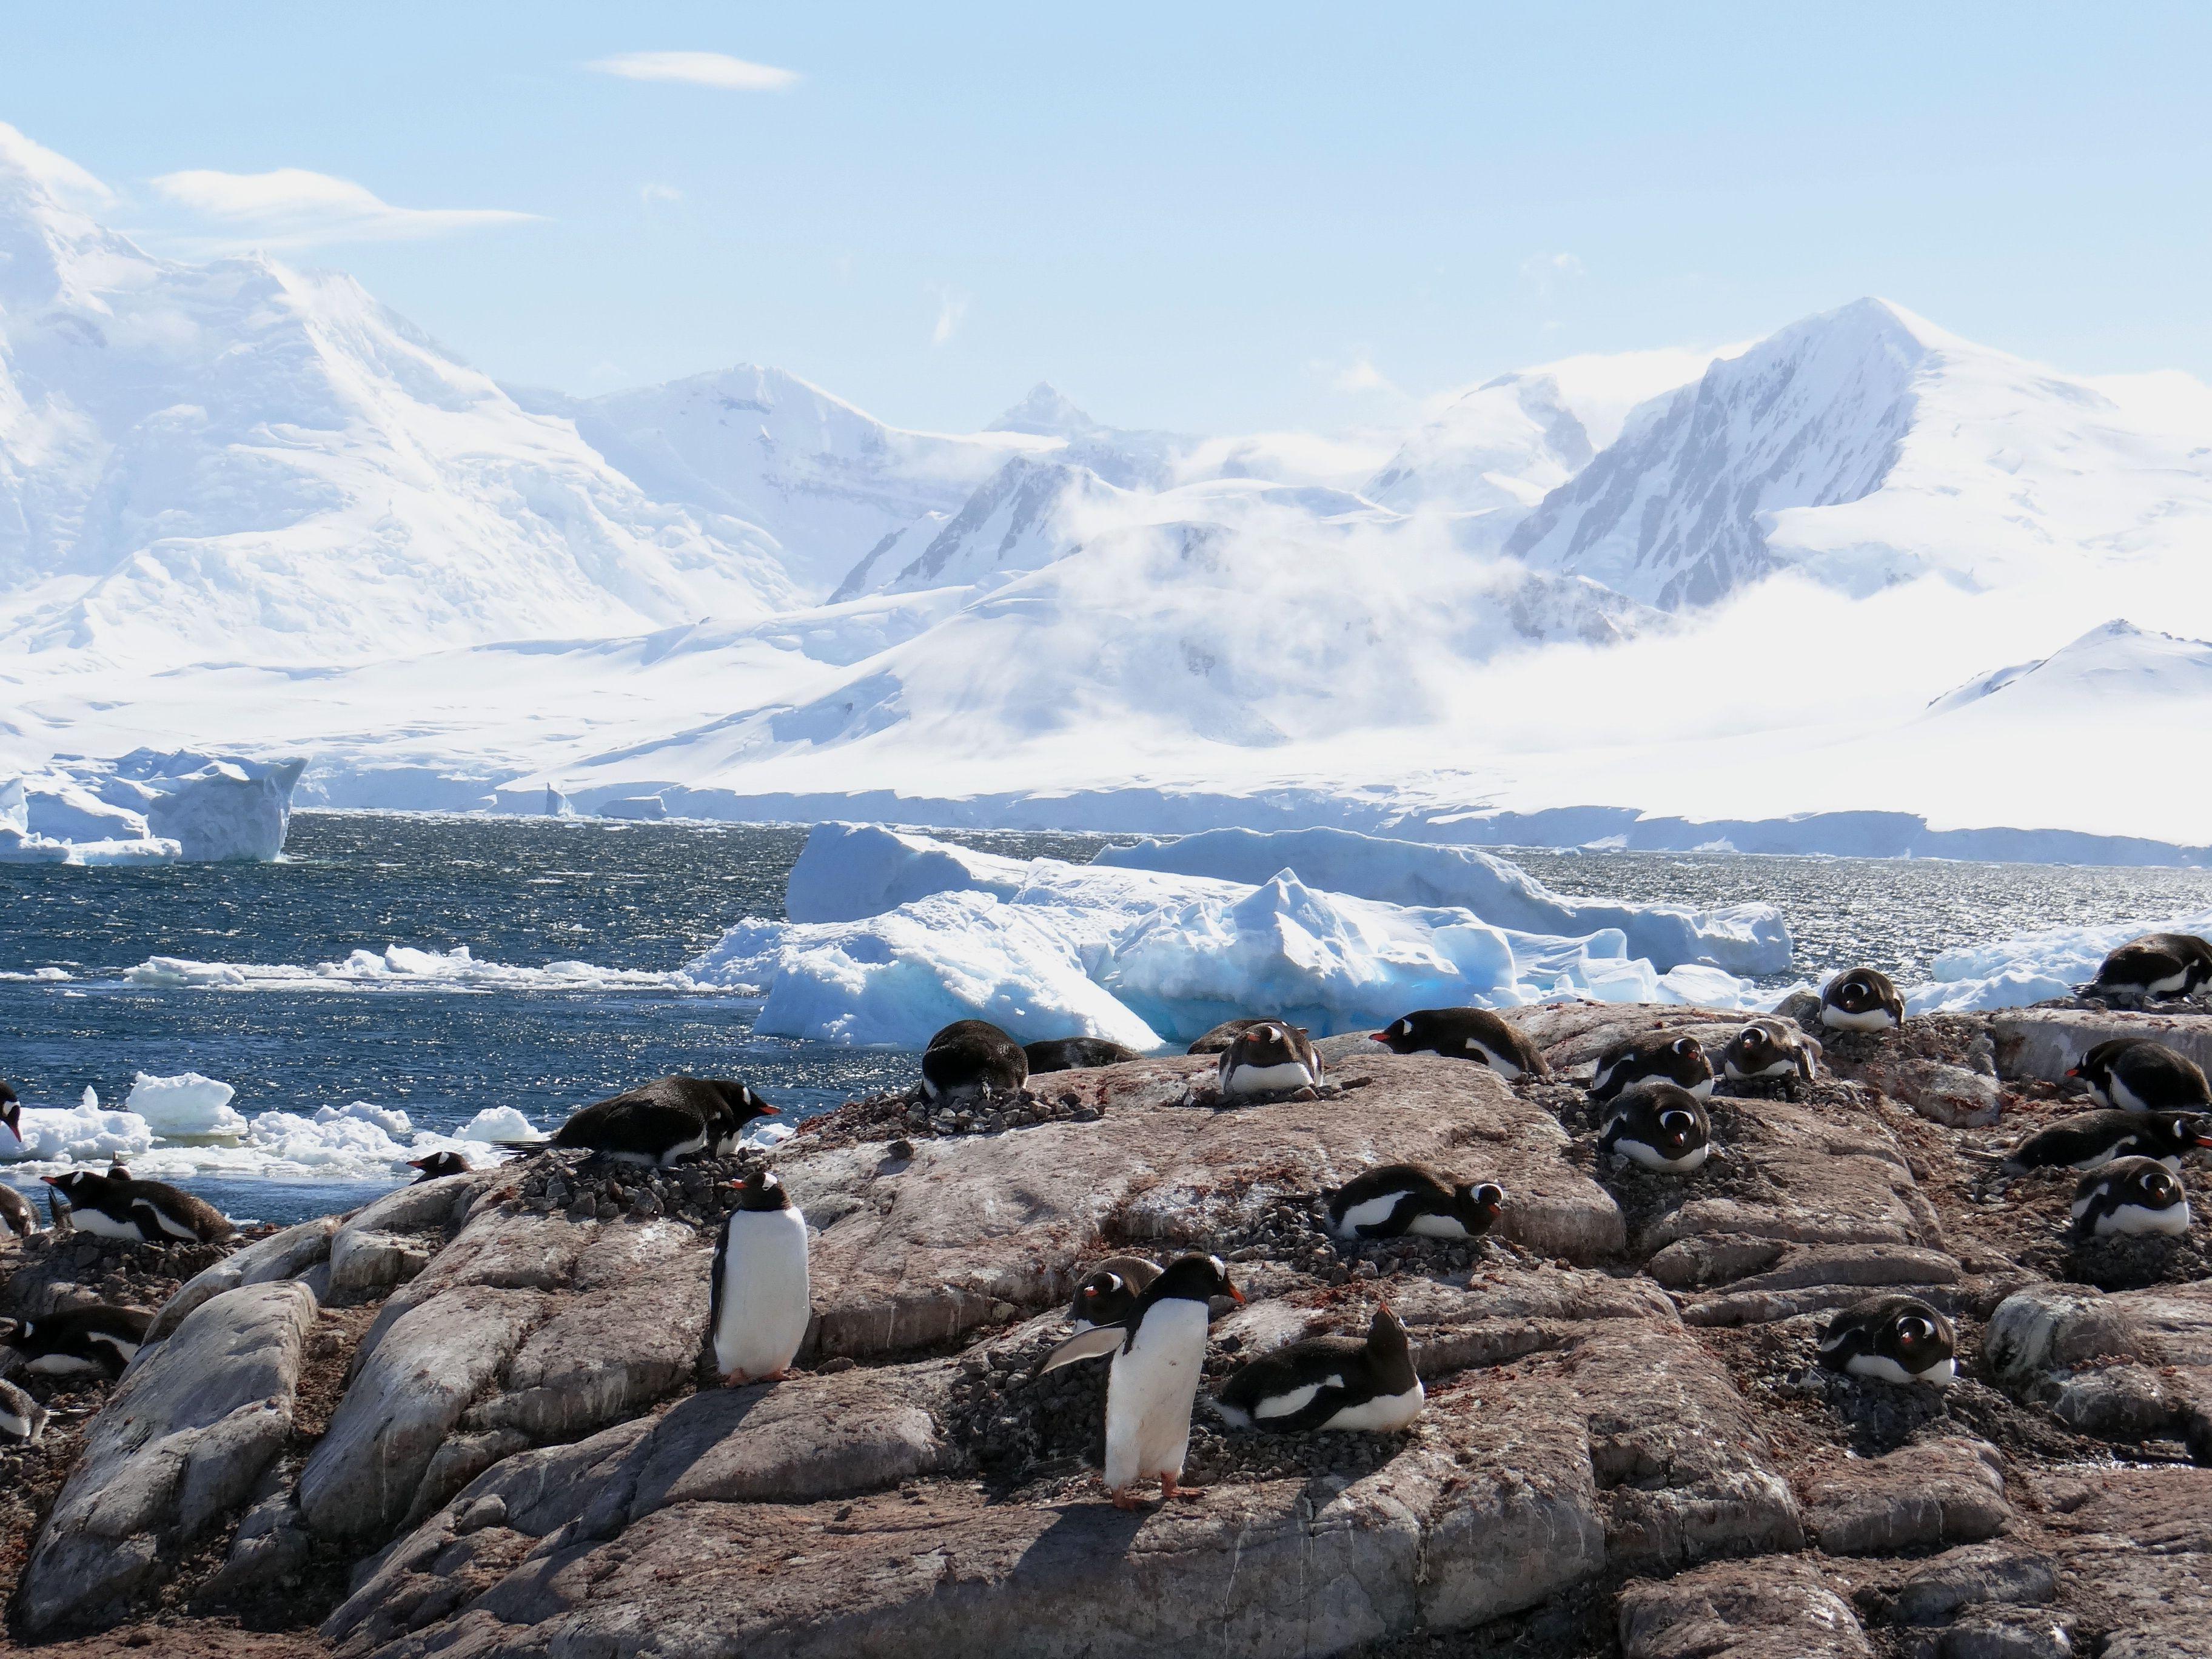 Penguins on the nest in Antarctica